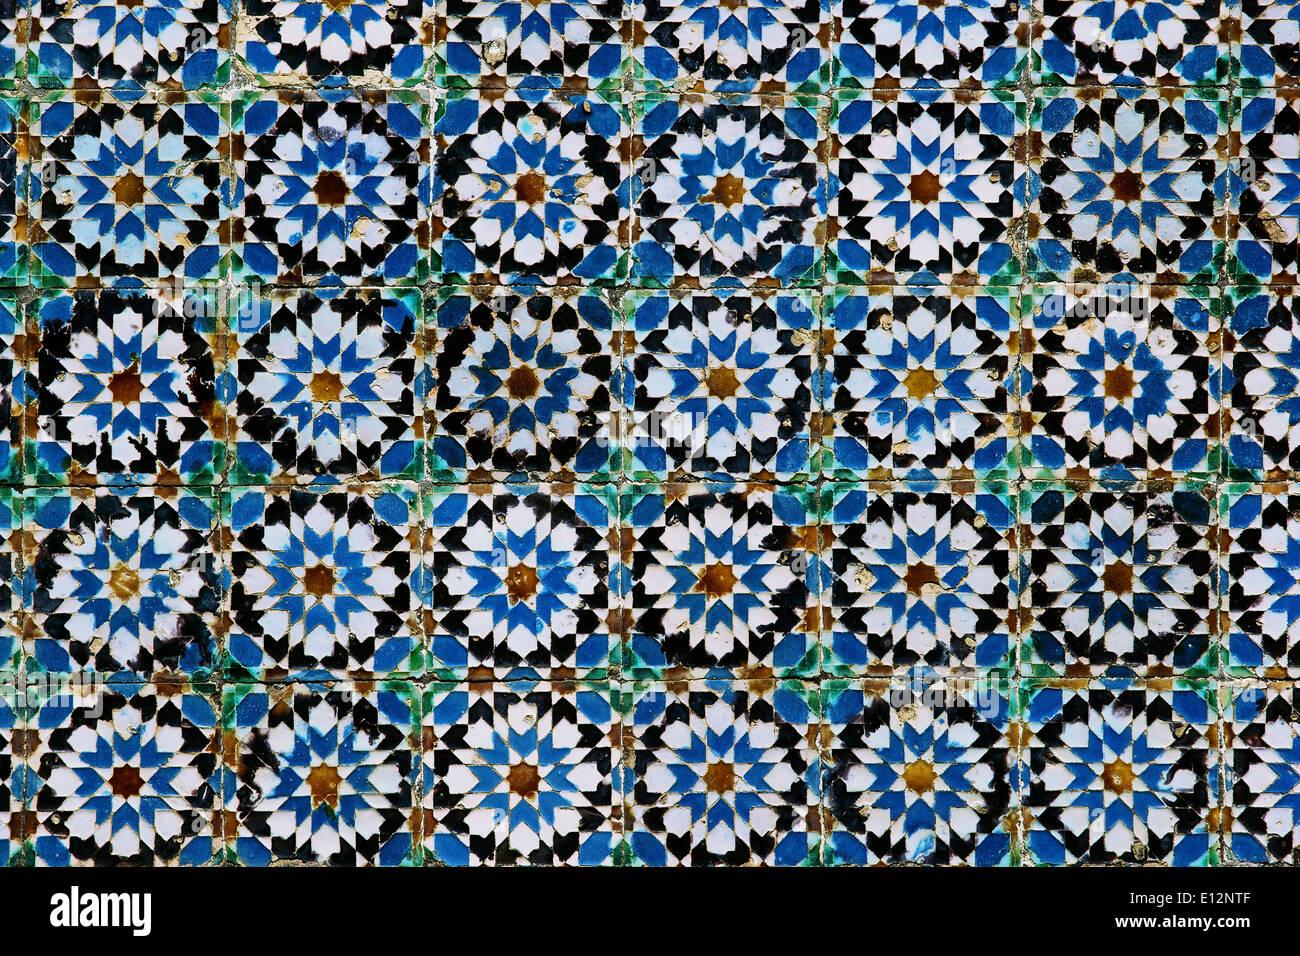 azulejos keramikziegel traditionellen typisch portugiesischen design palacio nacional da pena. Black Bedroom Furniture Sets. Home Design Ideas